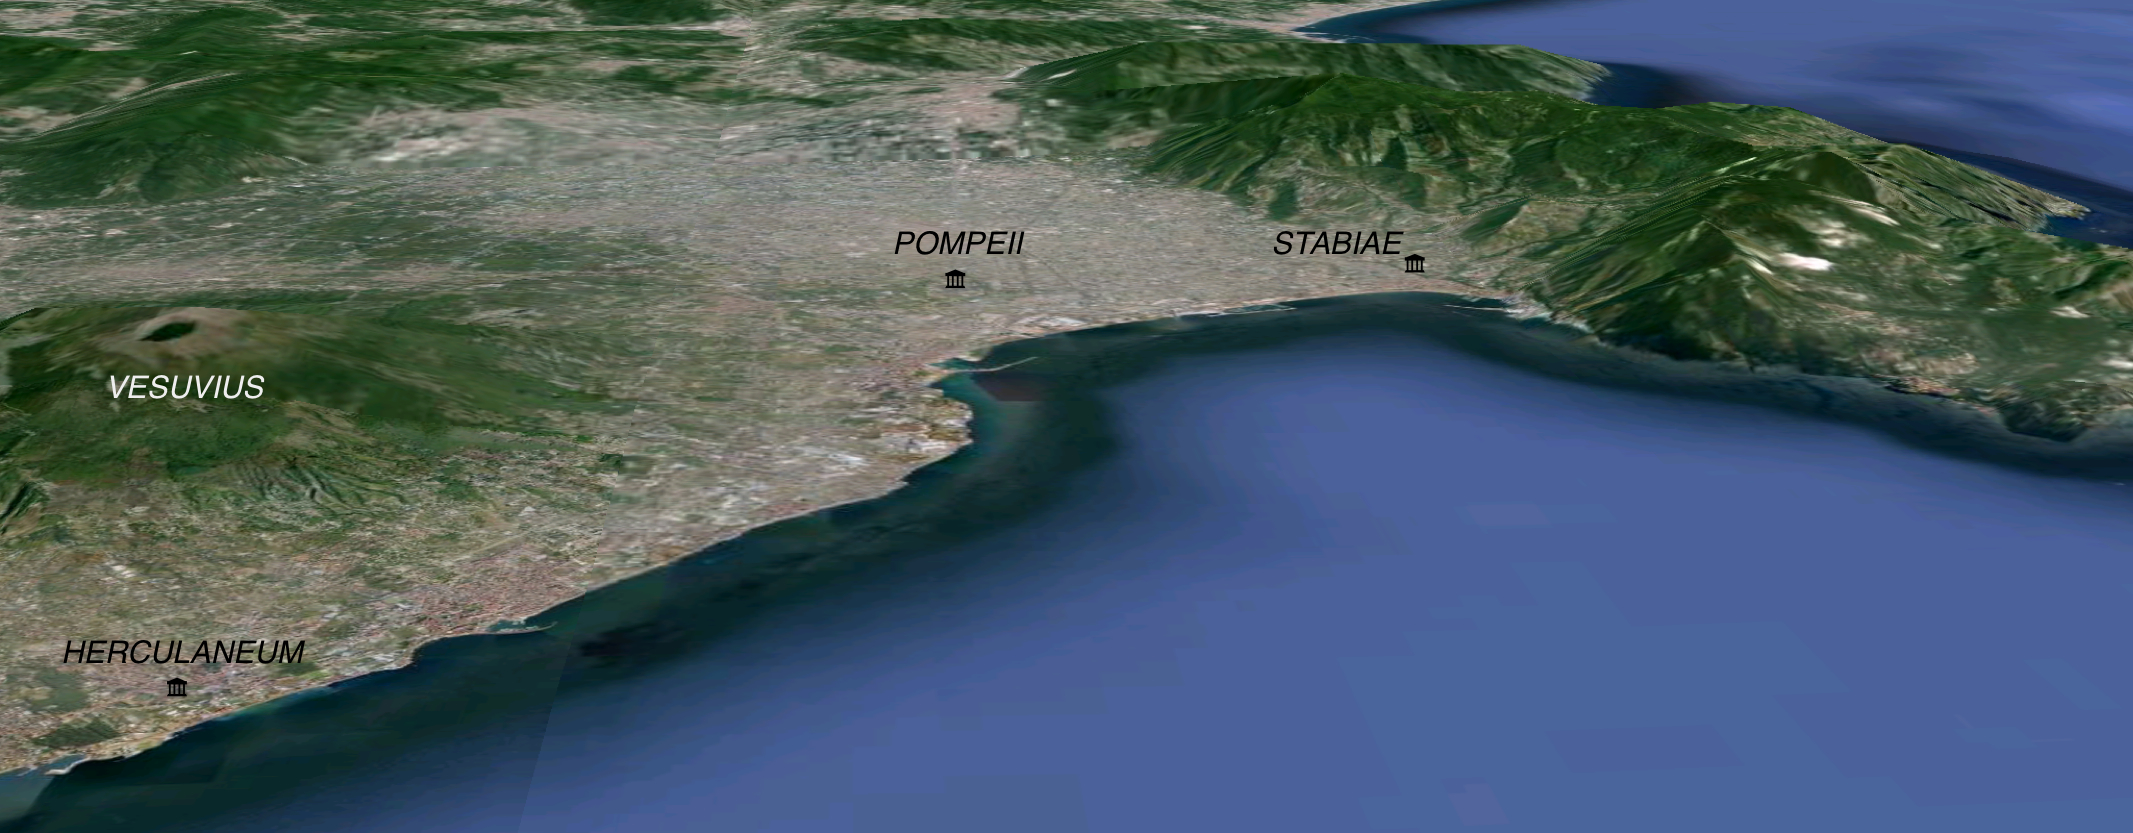 Pompeii Map Google Map Imagery Form Google